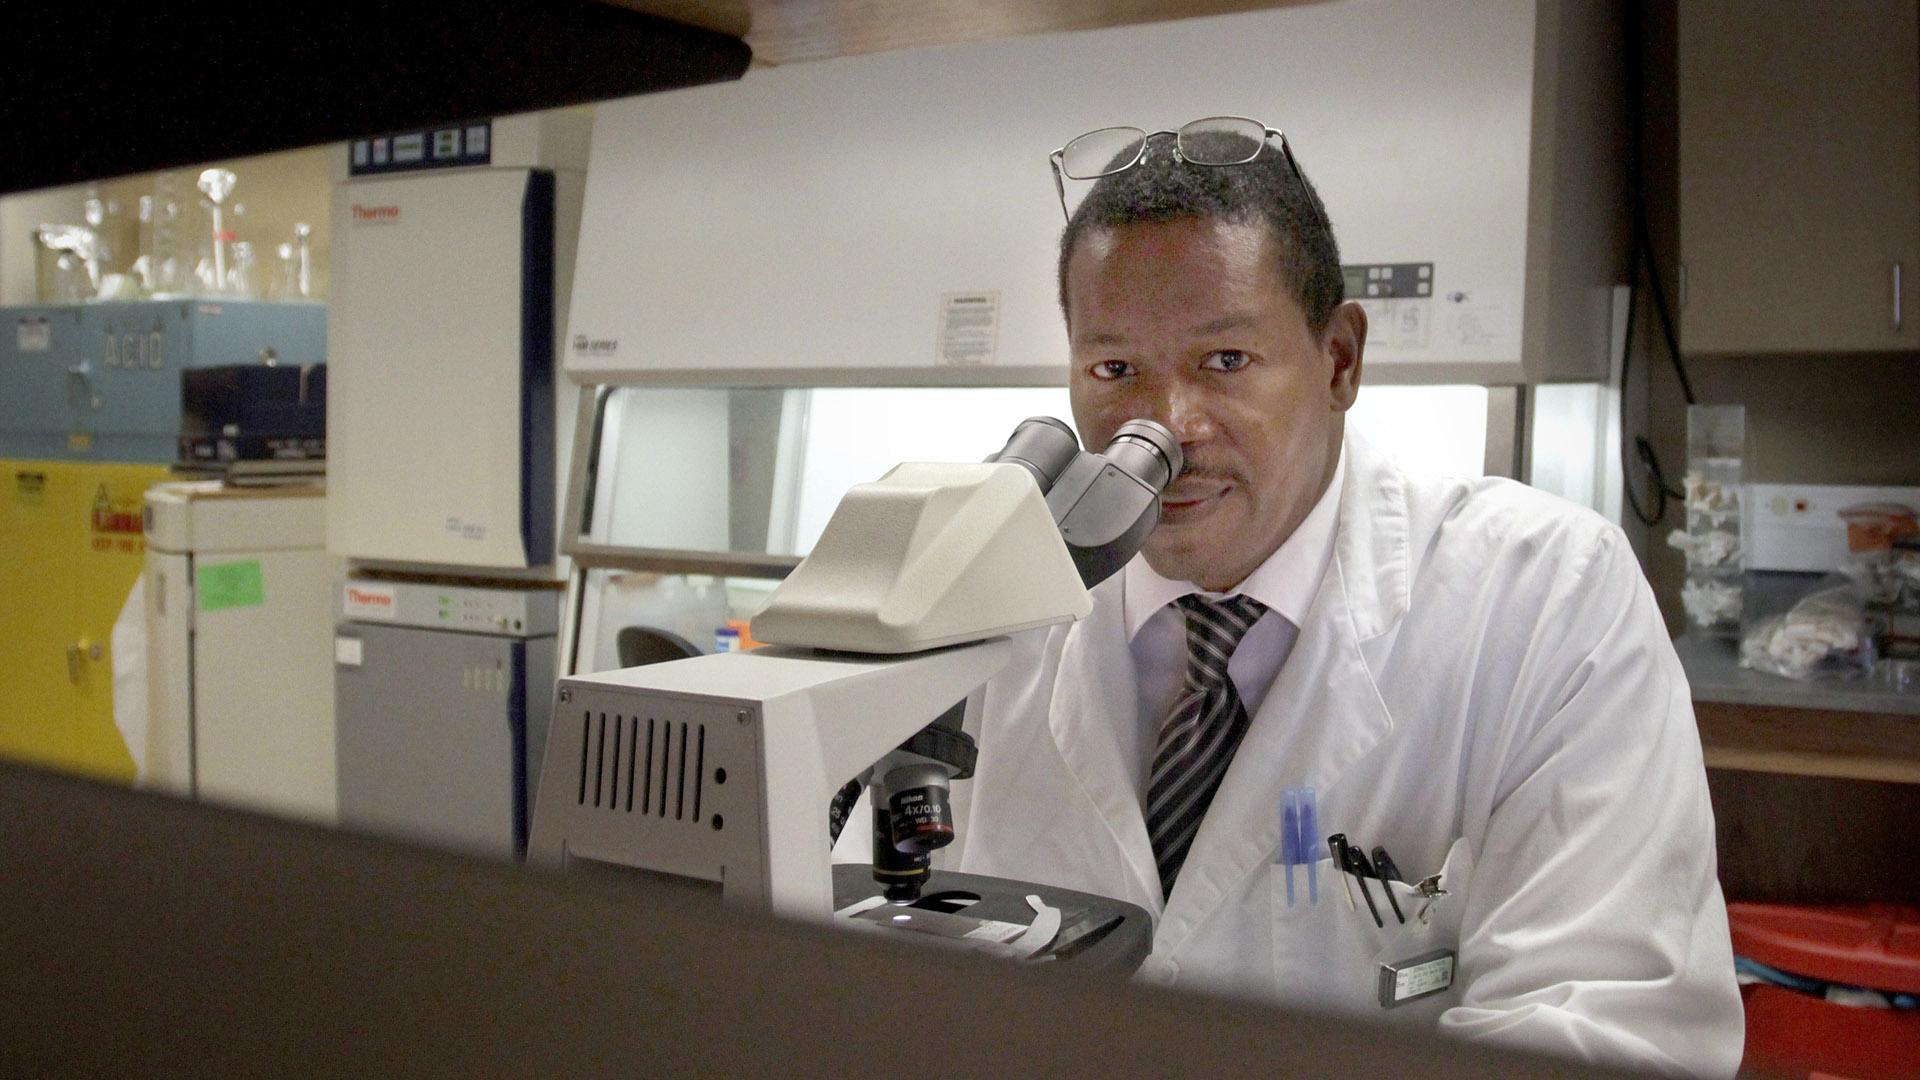 Dr. Alcendor in the lab